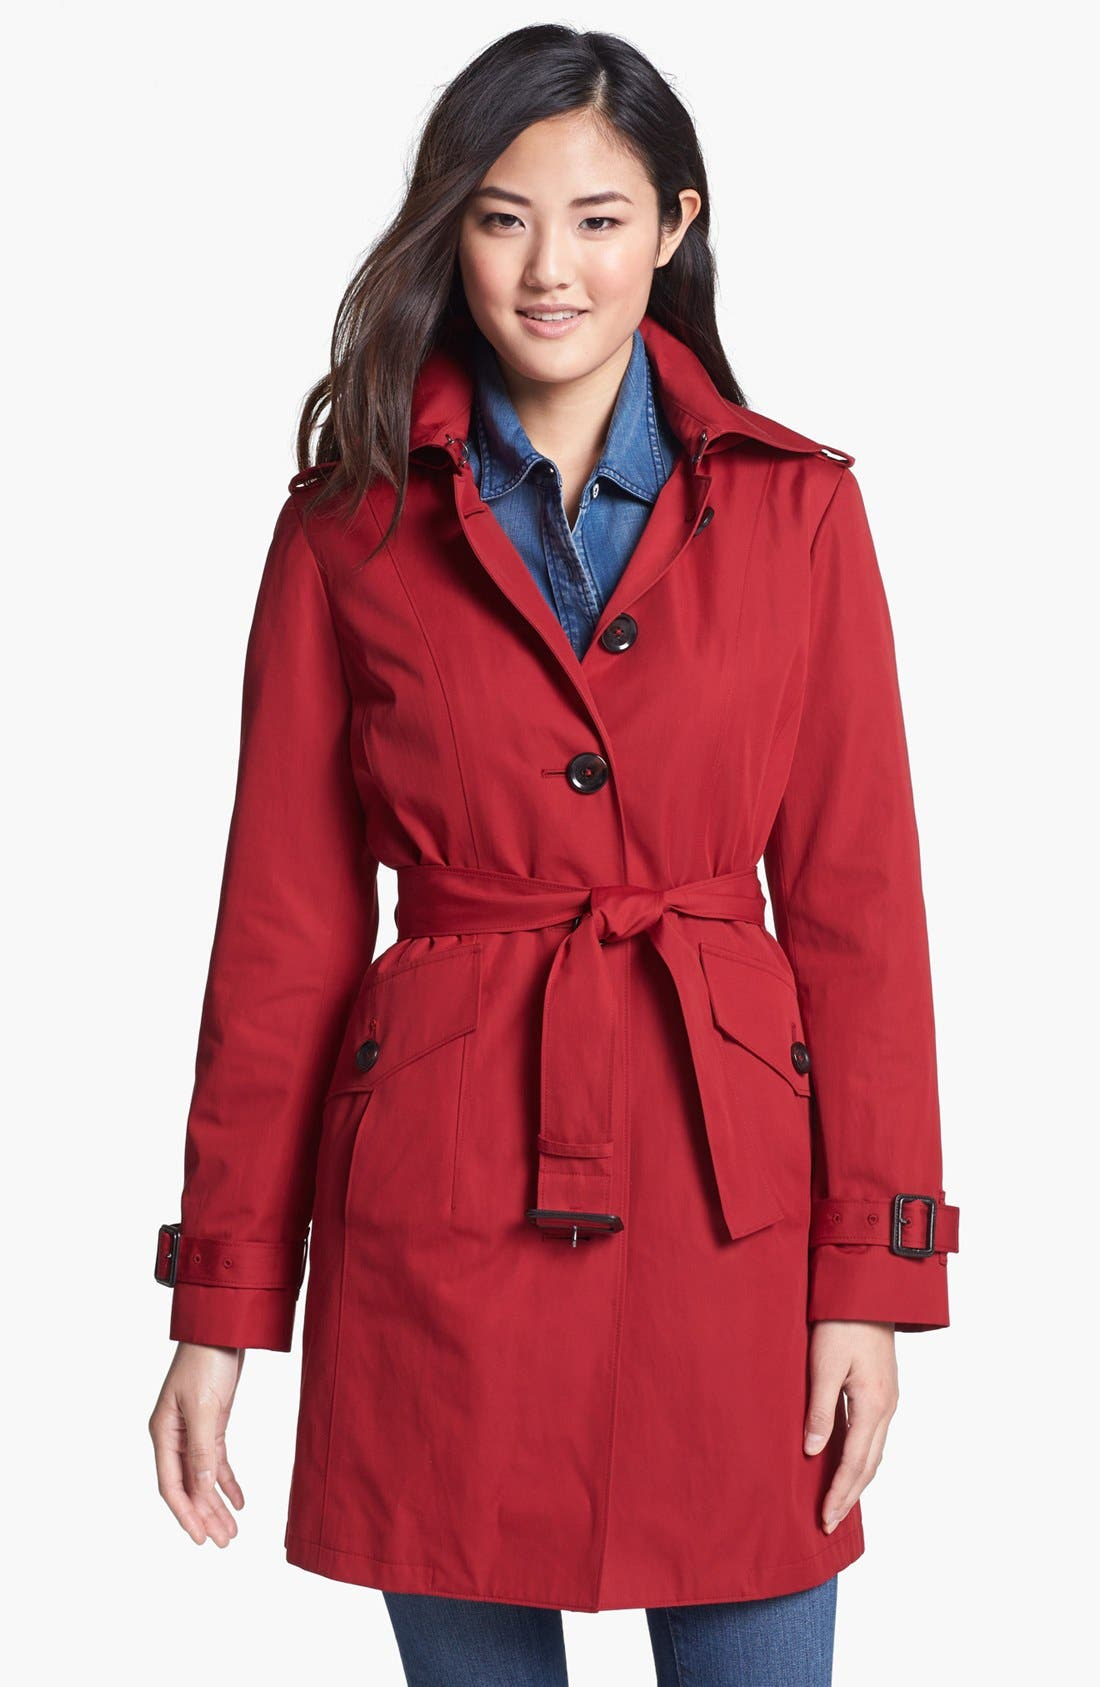 Alternate Image 1 Selected - MICHAEL Michael Kors Trench Coat with Detachable Hood (Regular & Petite) (Nordstrom Exclusive)